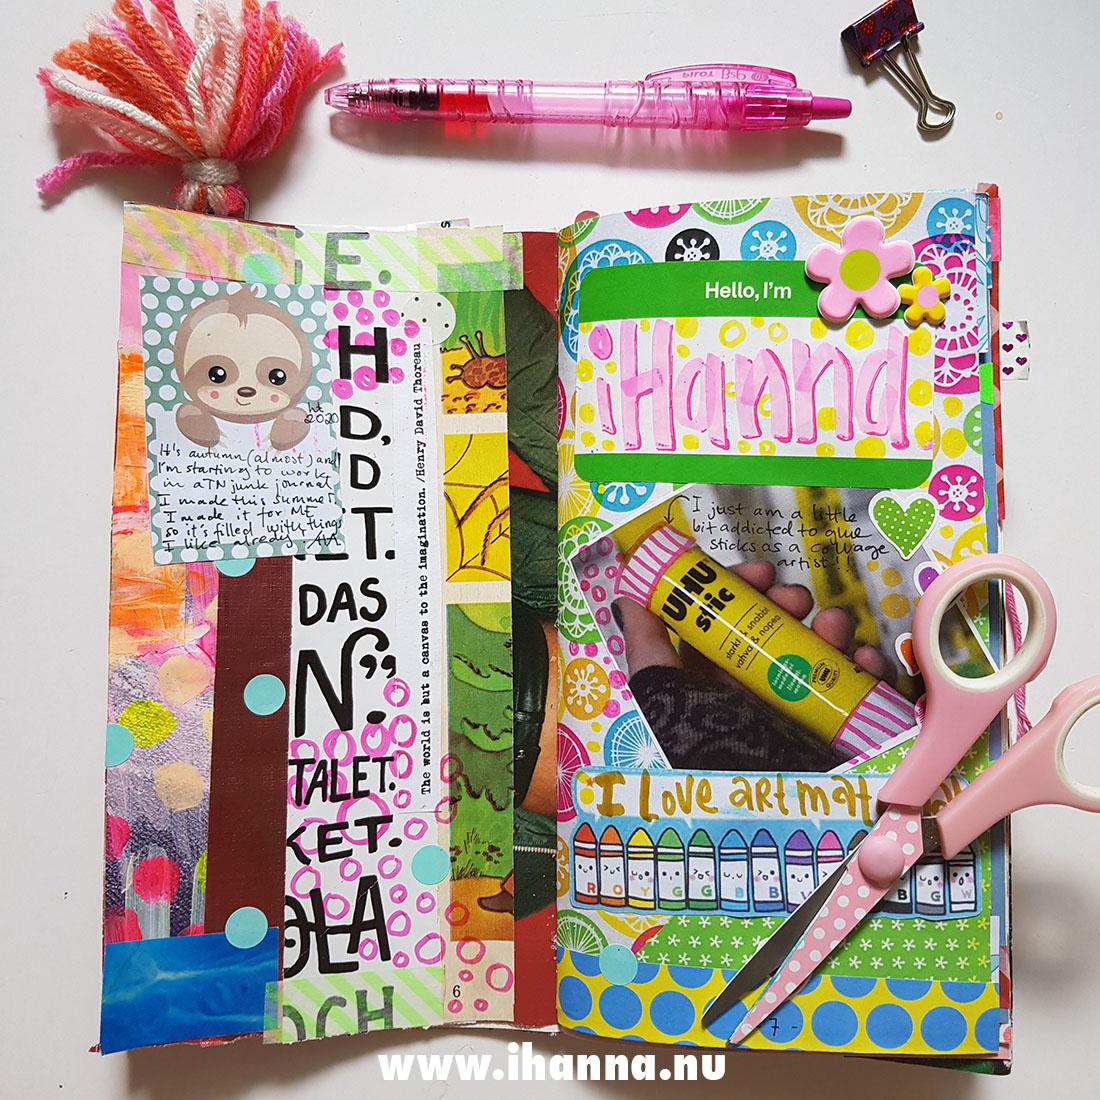 Hello I'm iHanna junk journal presentation by Hanna Andersson